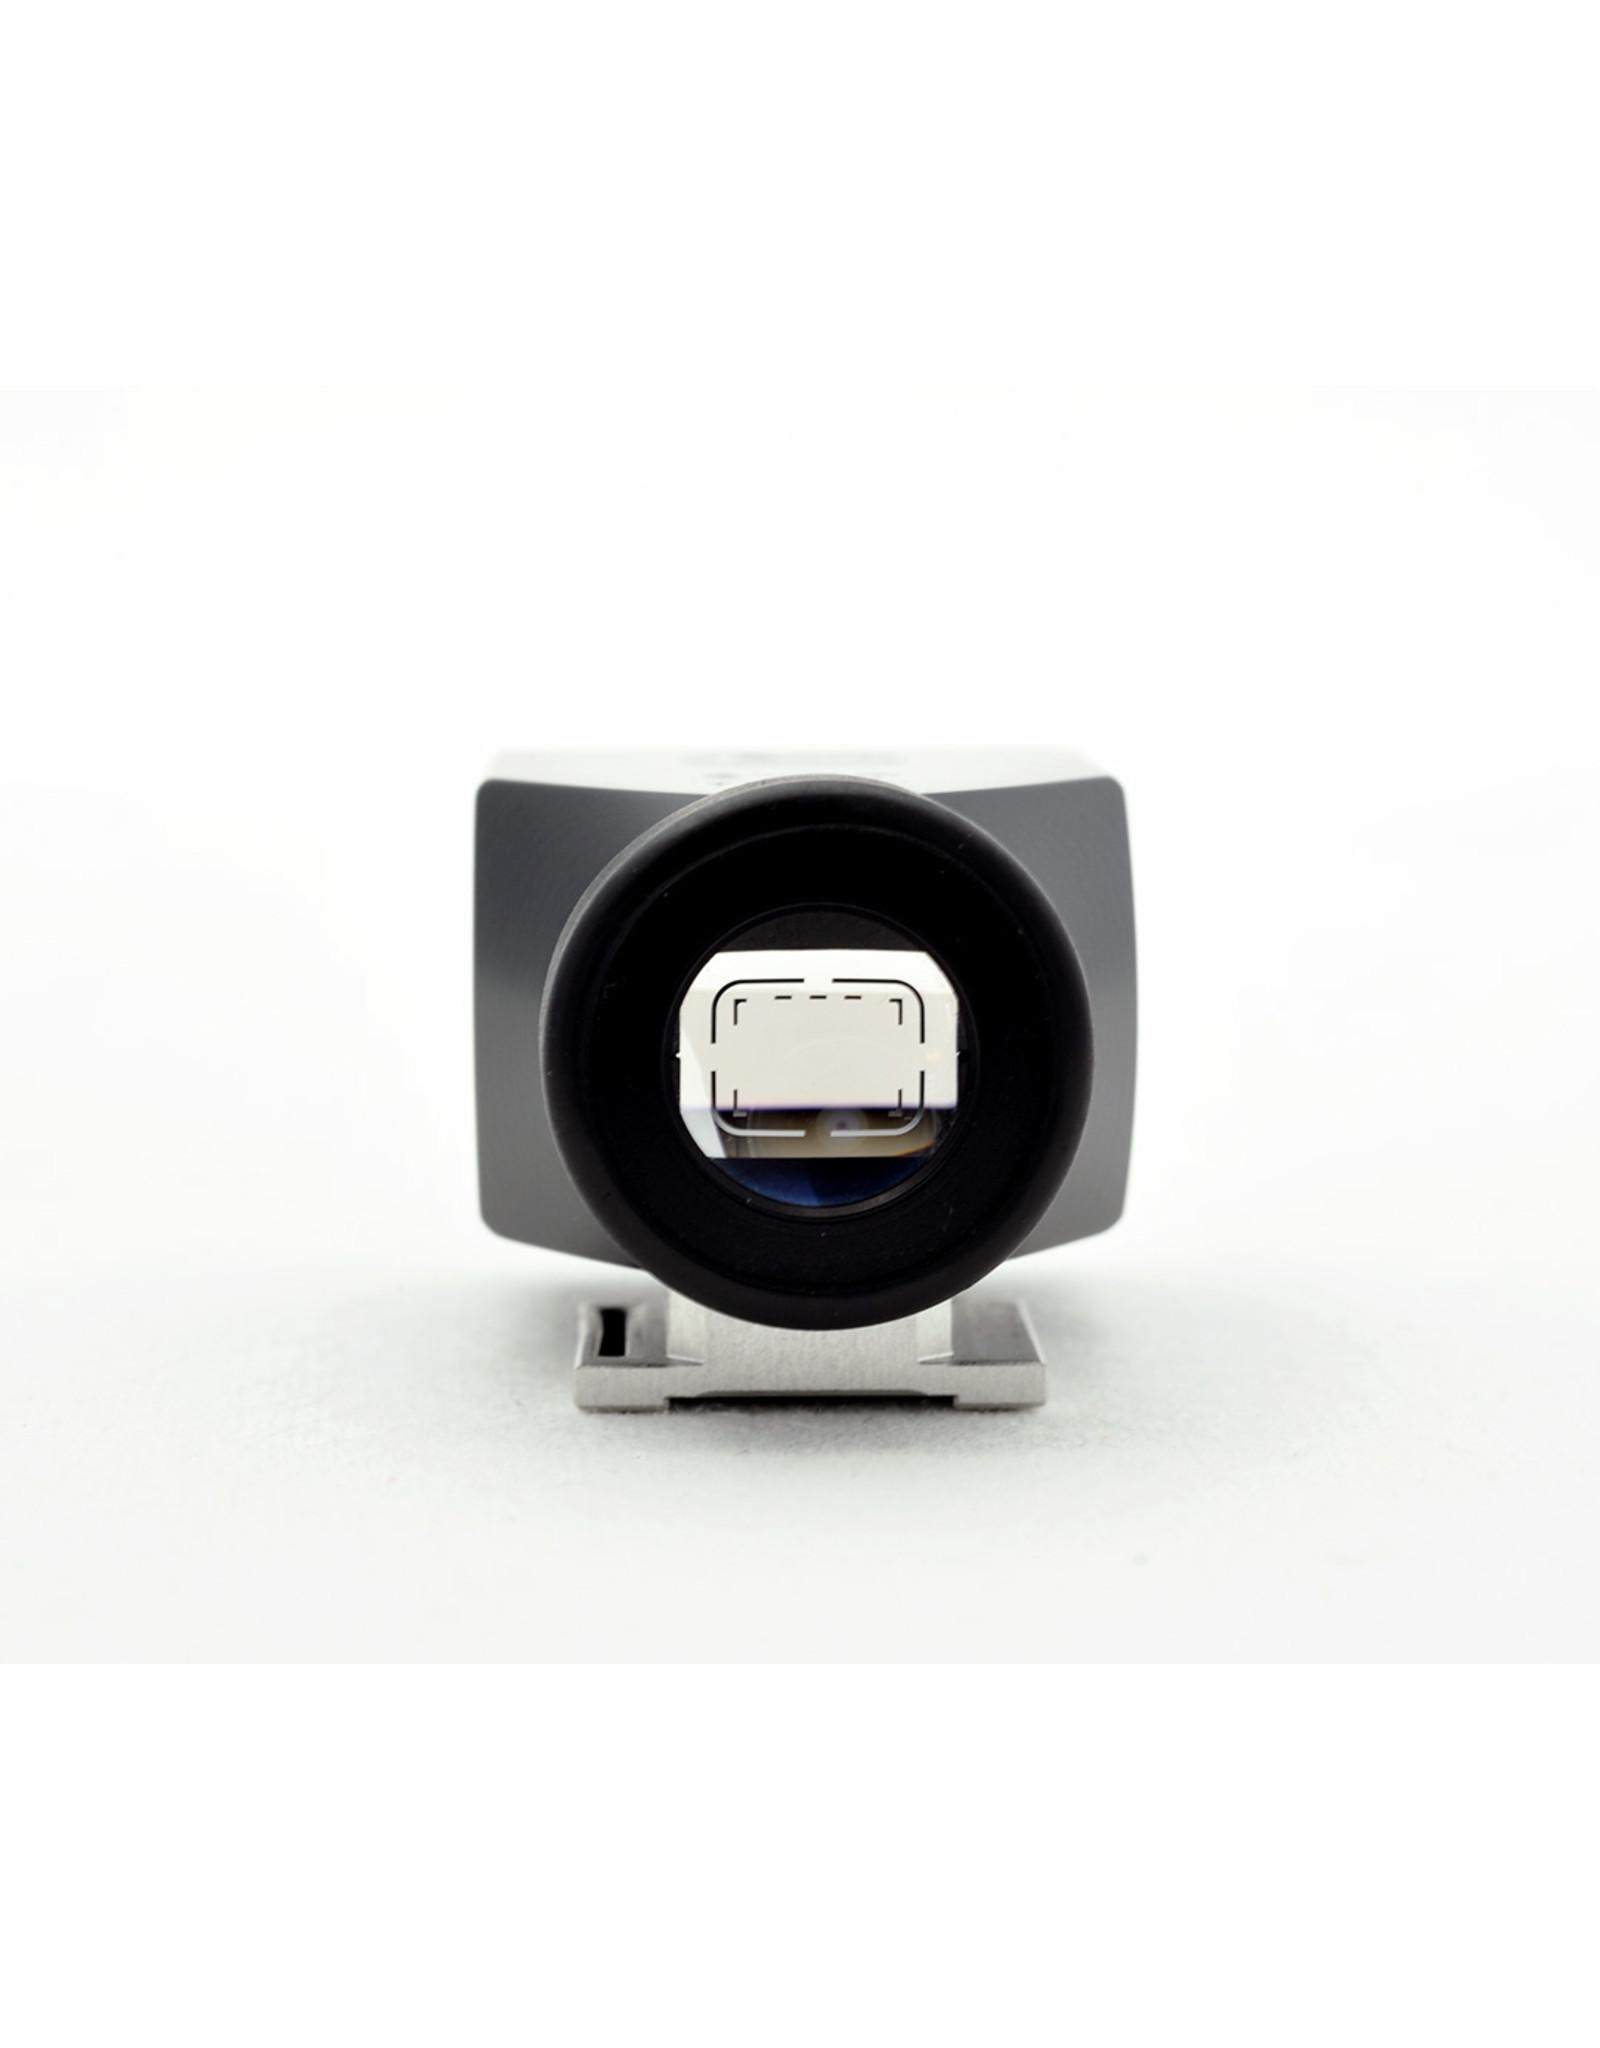 Leica Leica 24mm Bright Line View finder Metal Black   AP2121112